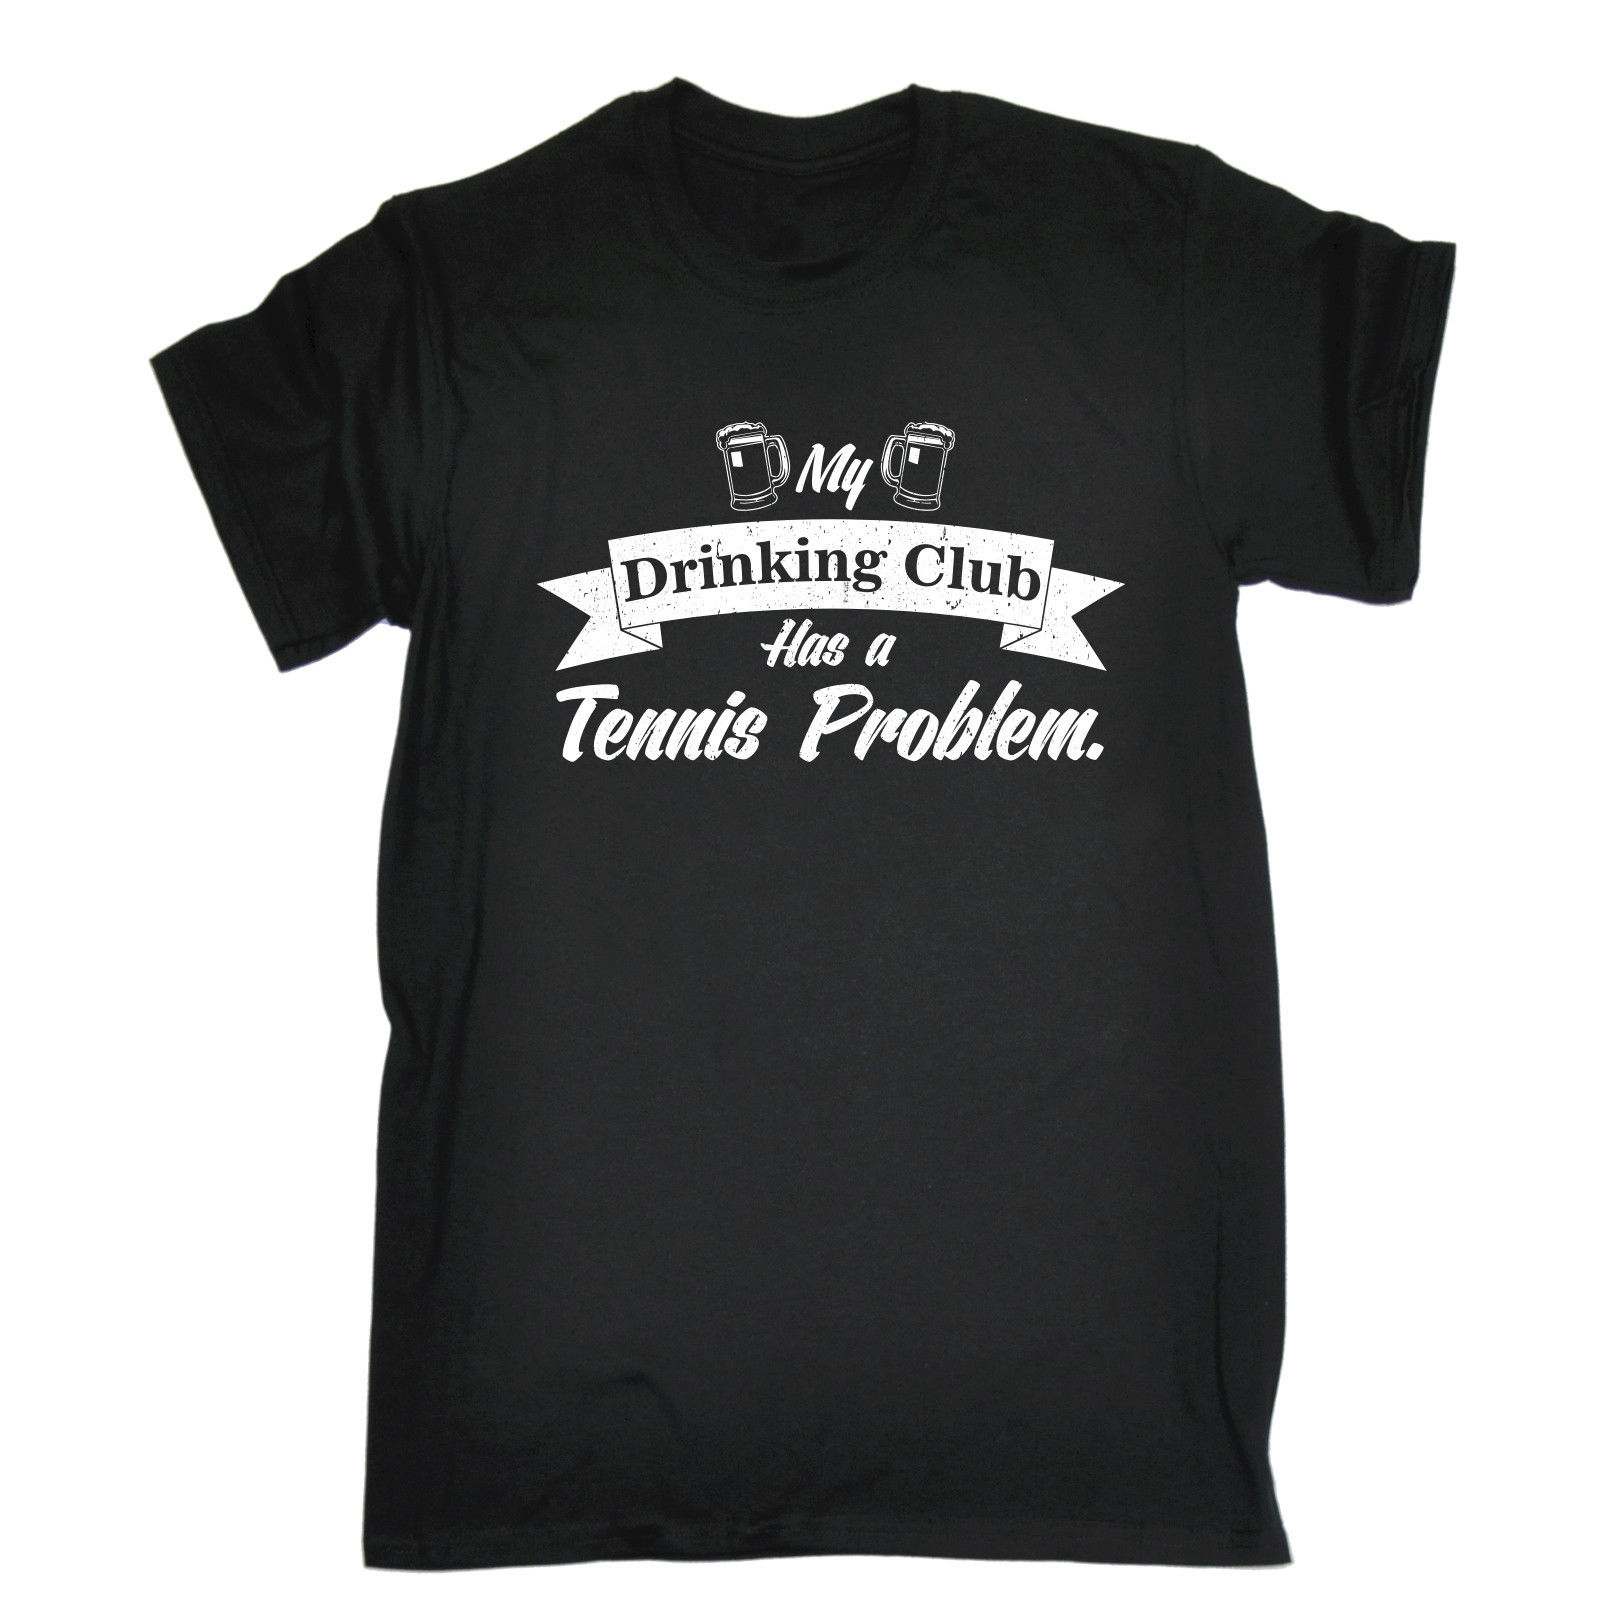 My Drinking Club Has A Tenniser Problem T Shirt Racquet Ball Funny Gift Birthday T Shirt Fashiont Shirt Free Shipping Top Tee